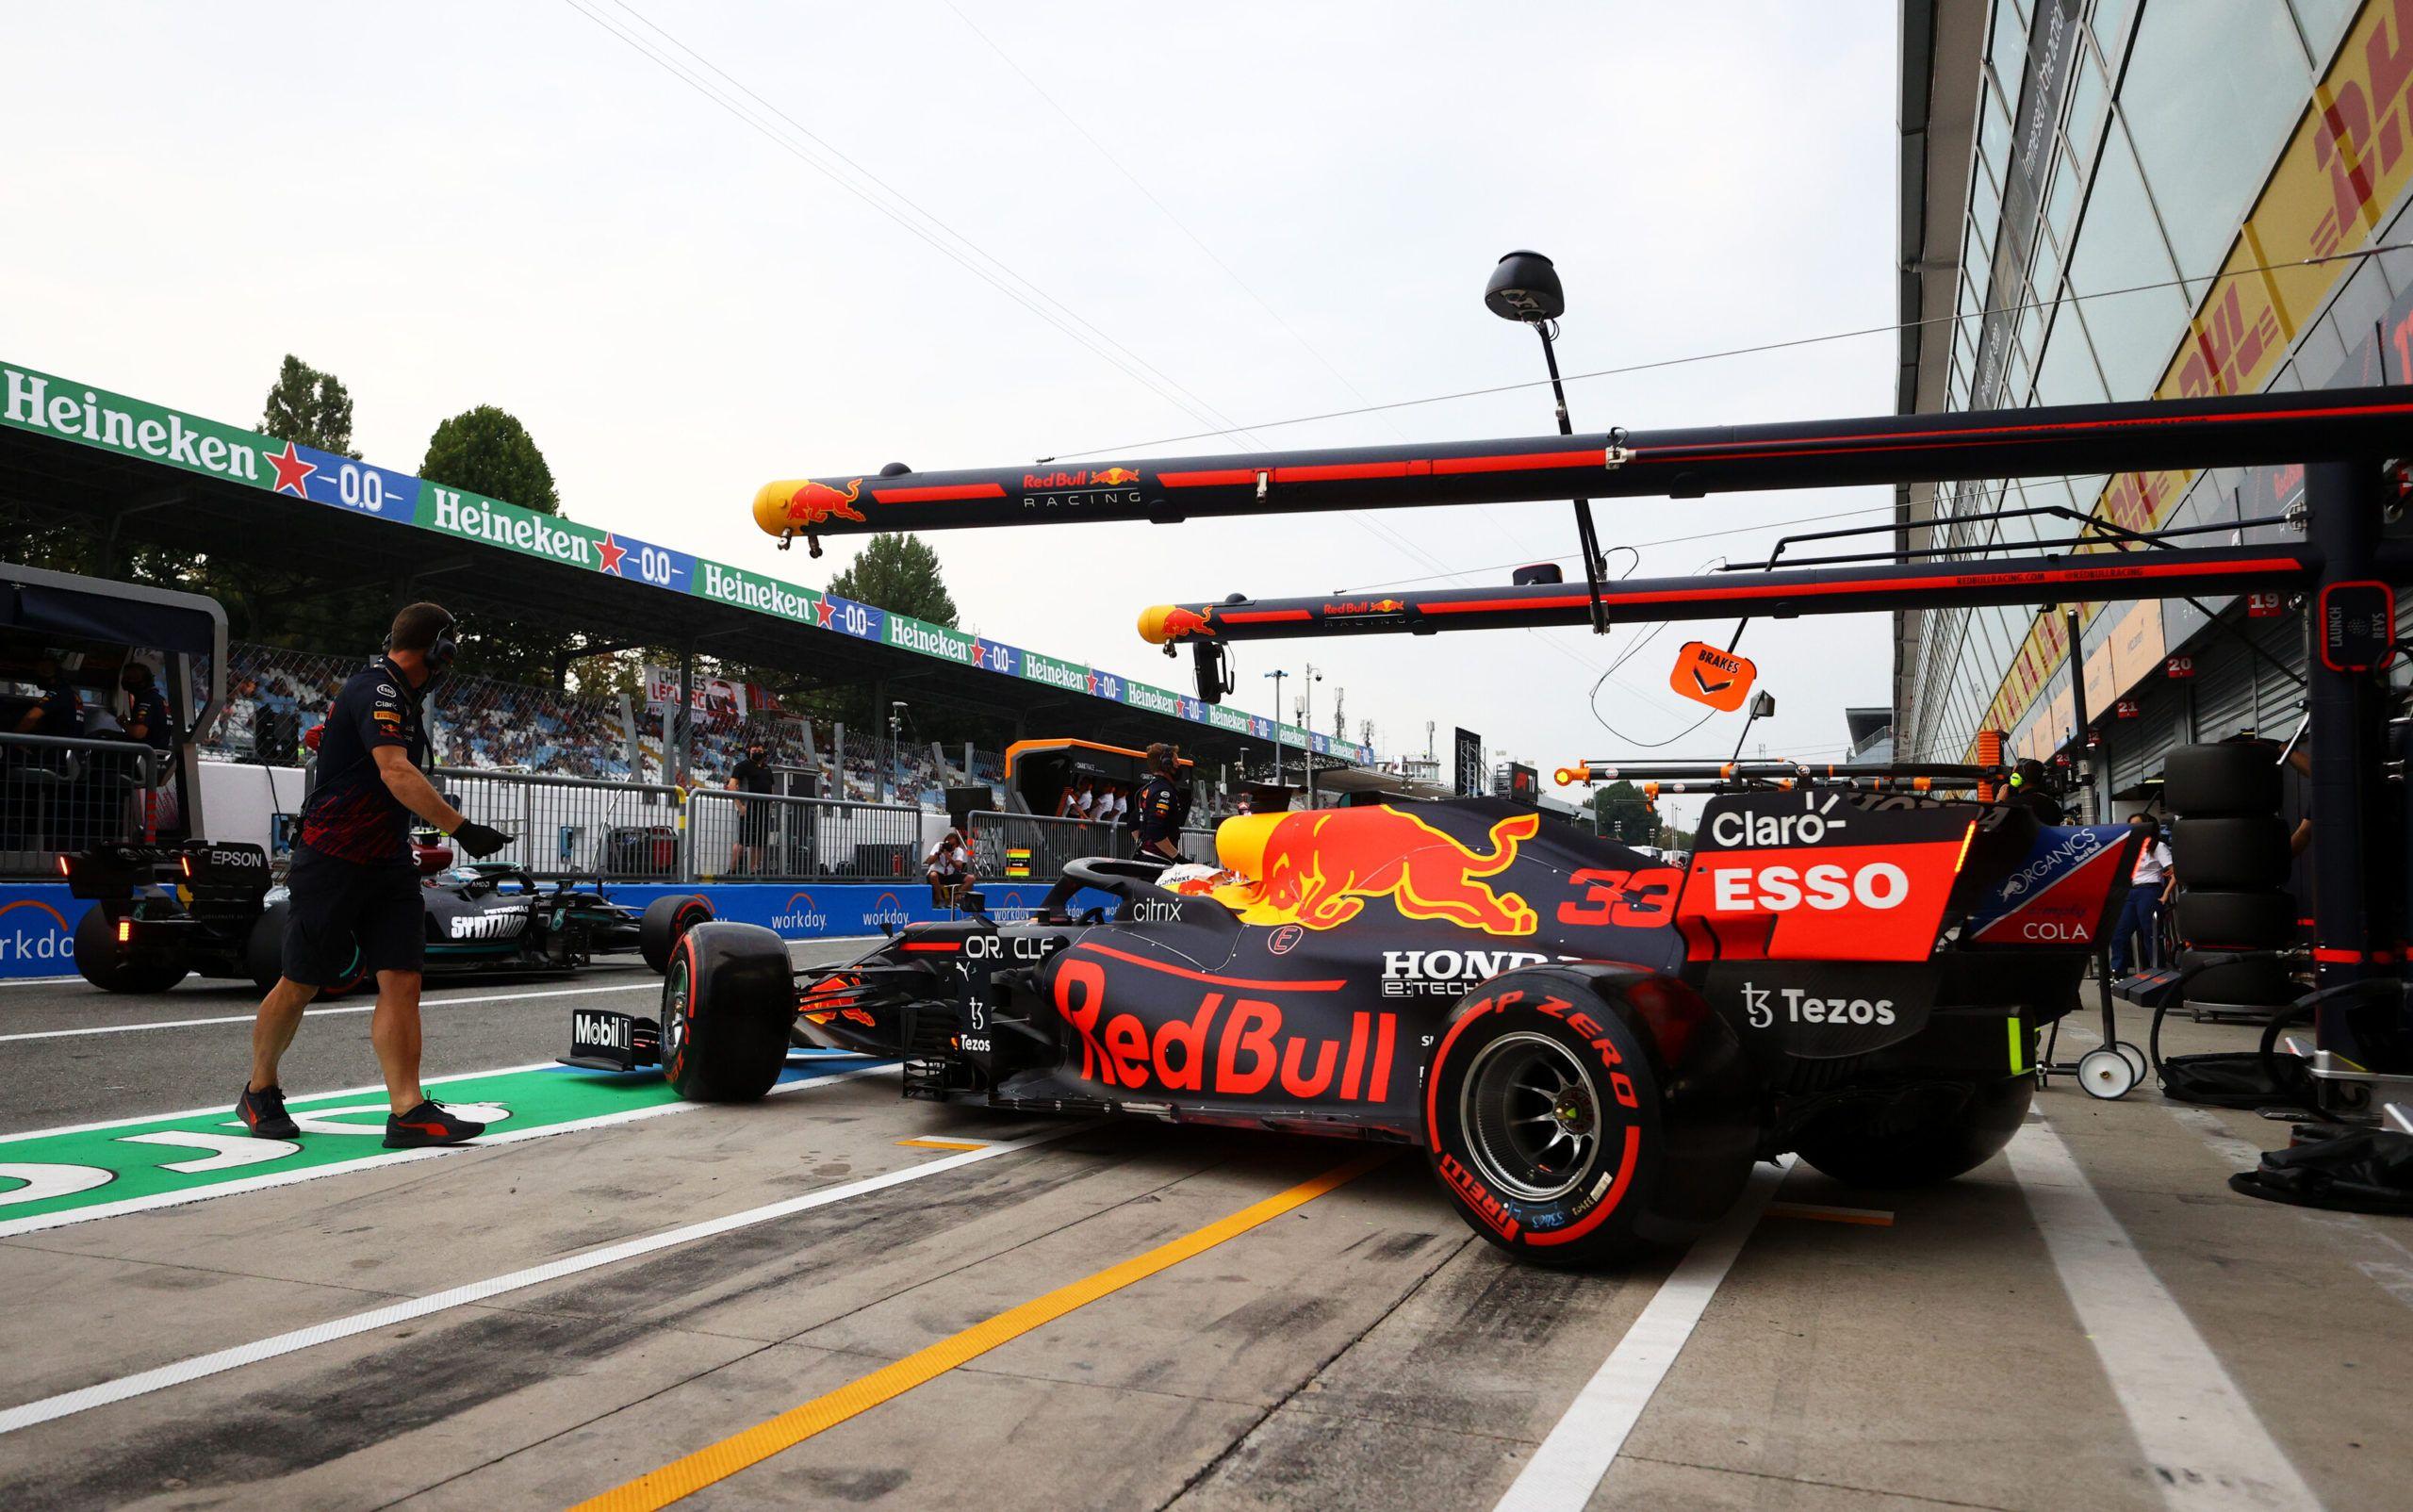 Honda, F1, Red Bull